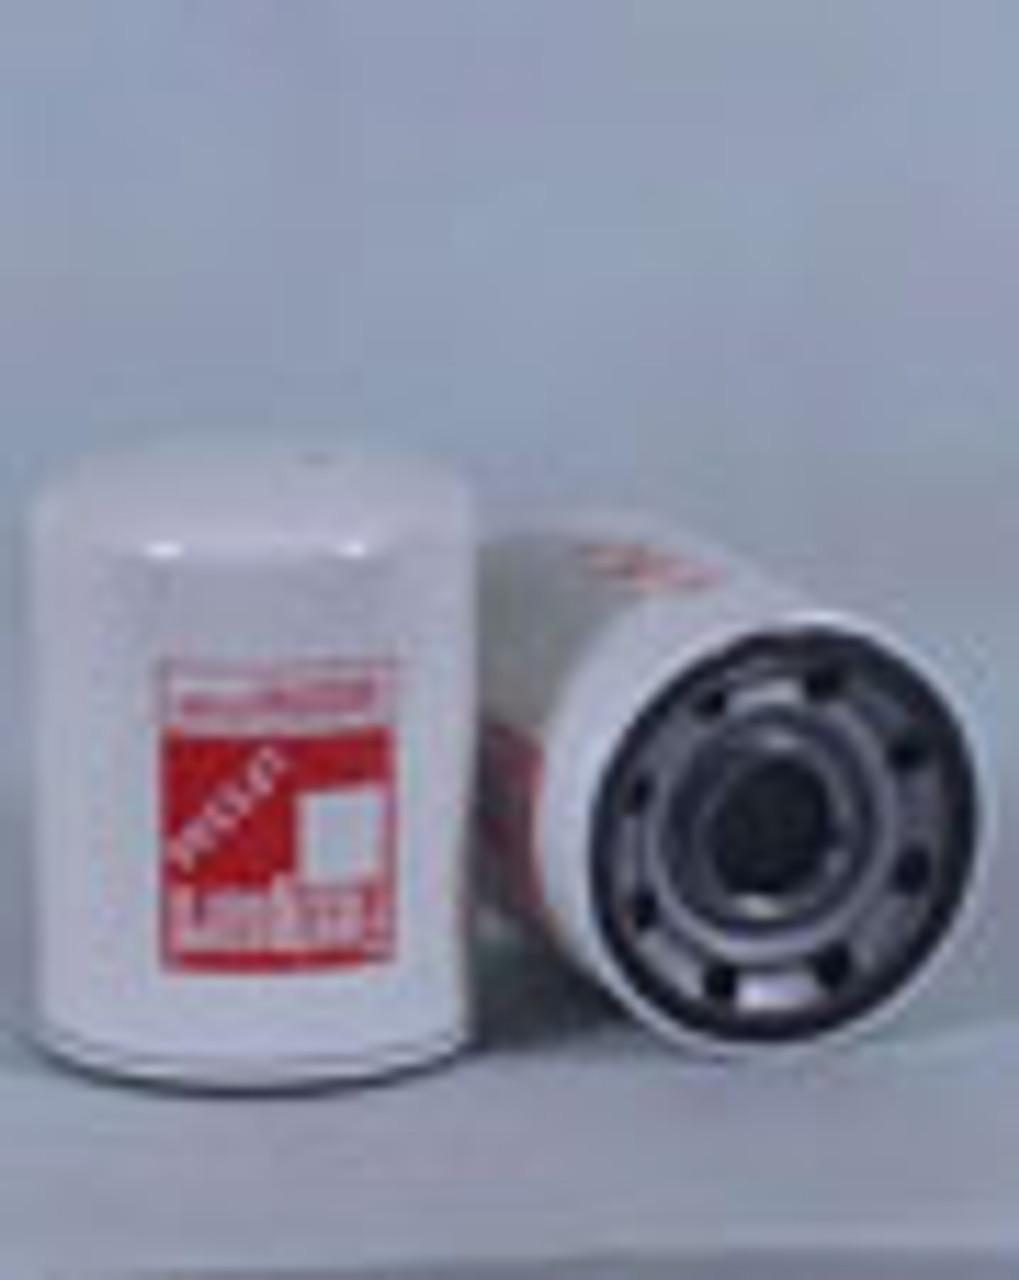 Fleetguard Lube Filter Full Flow Spin On Part No LF3344